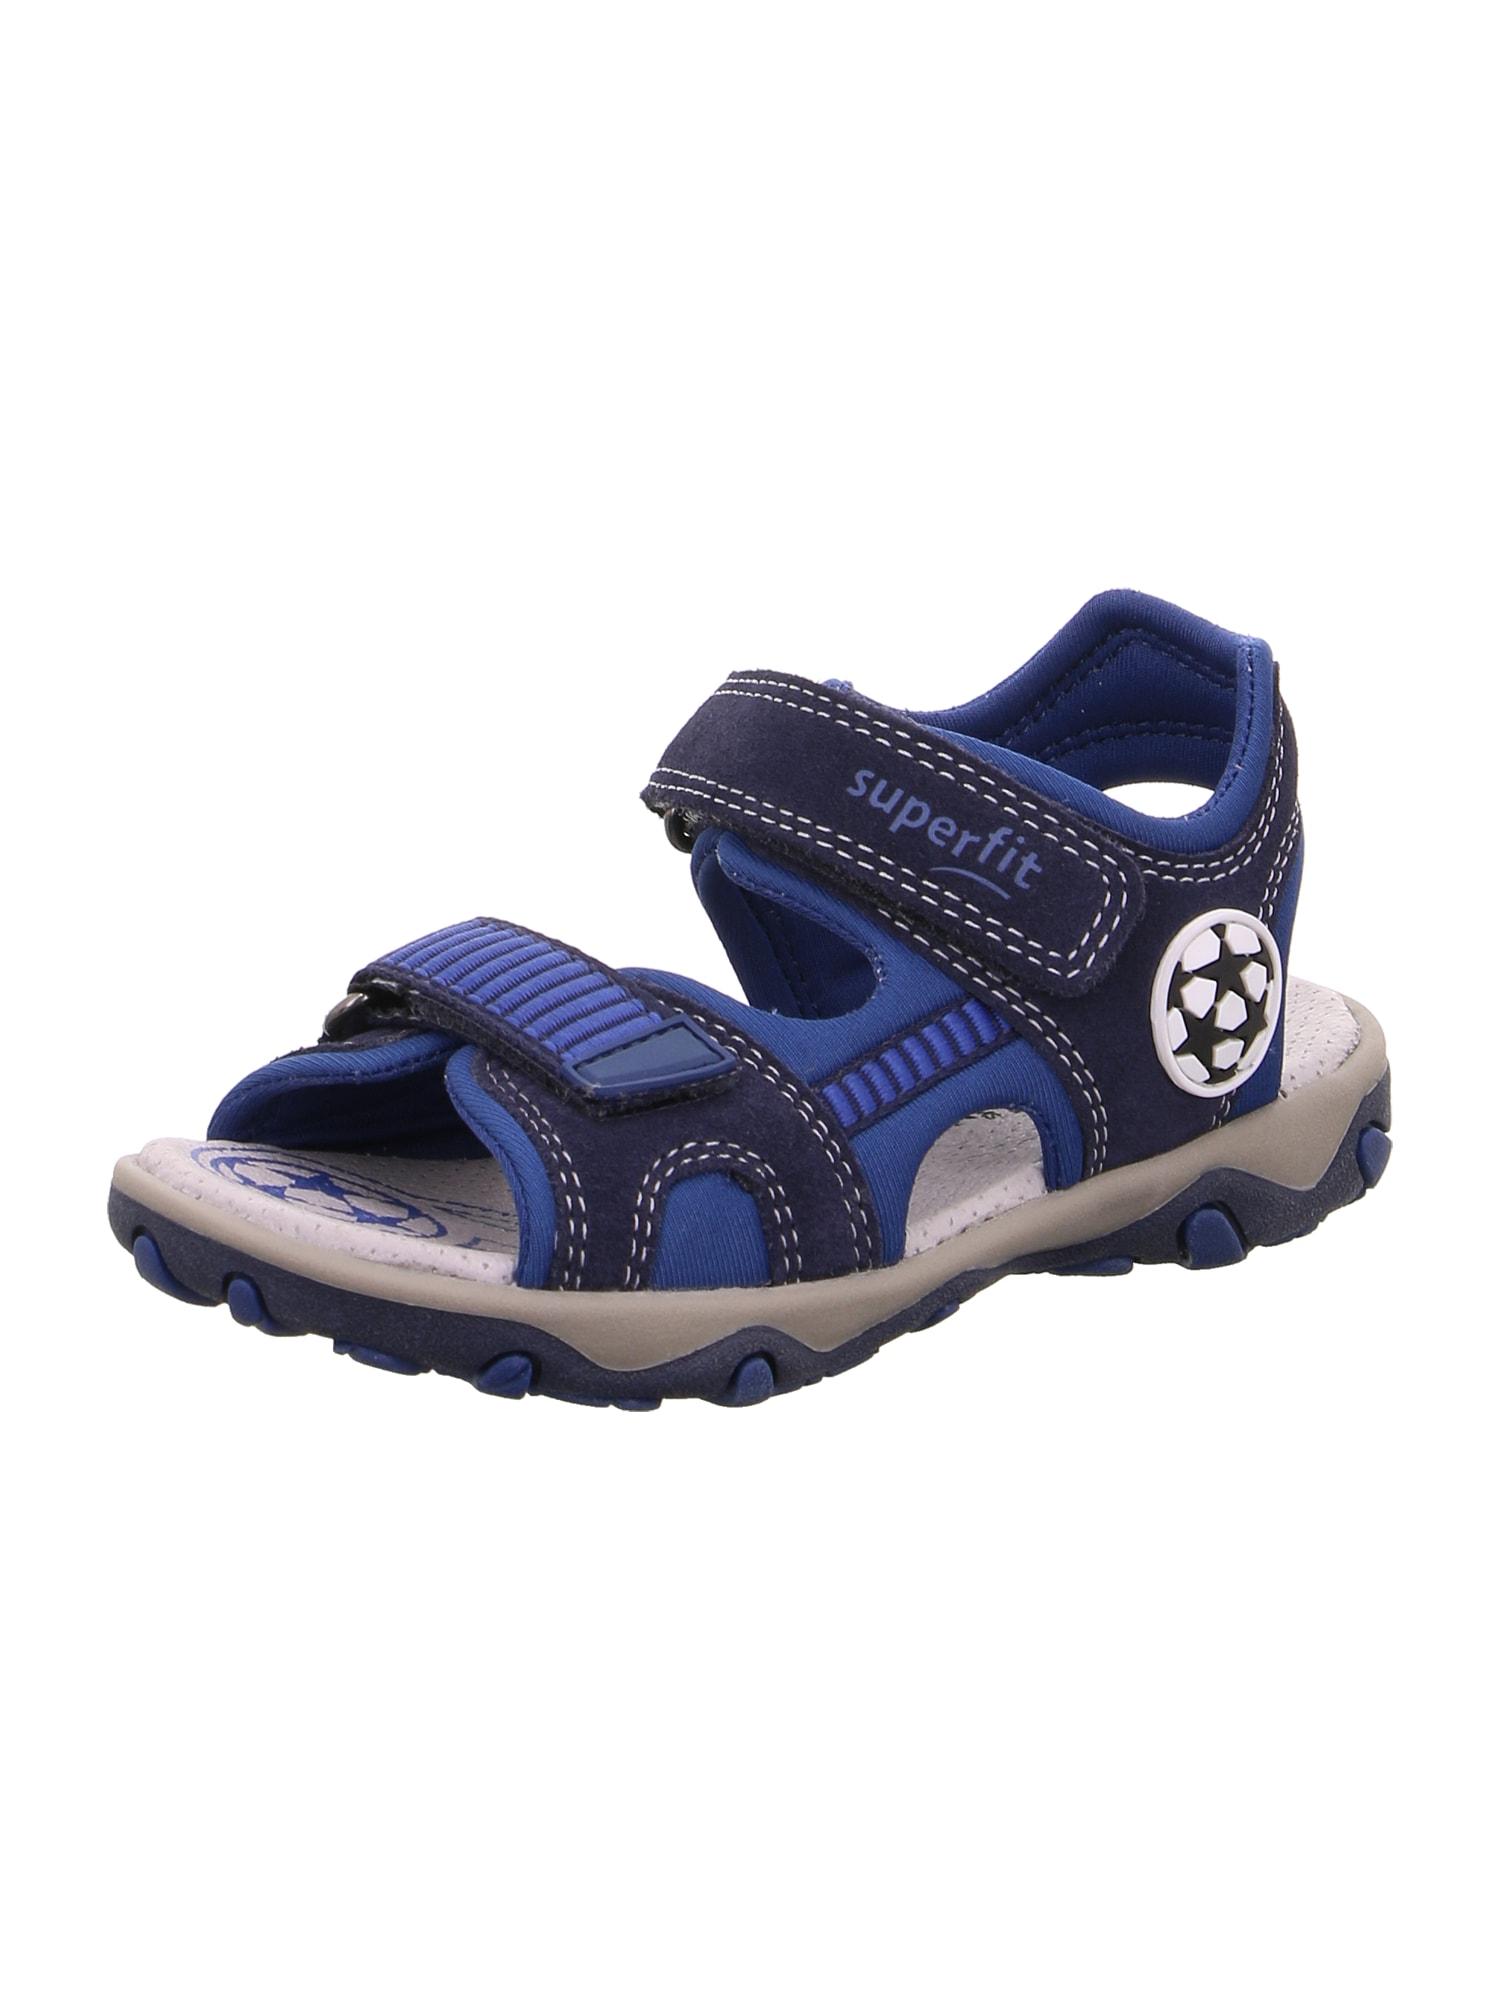 SUPERFIT Atviri batai 'MIKE 3.0' mėlyna / tamsiai mėlyna